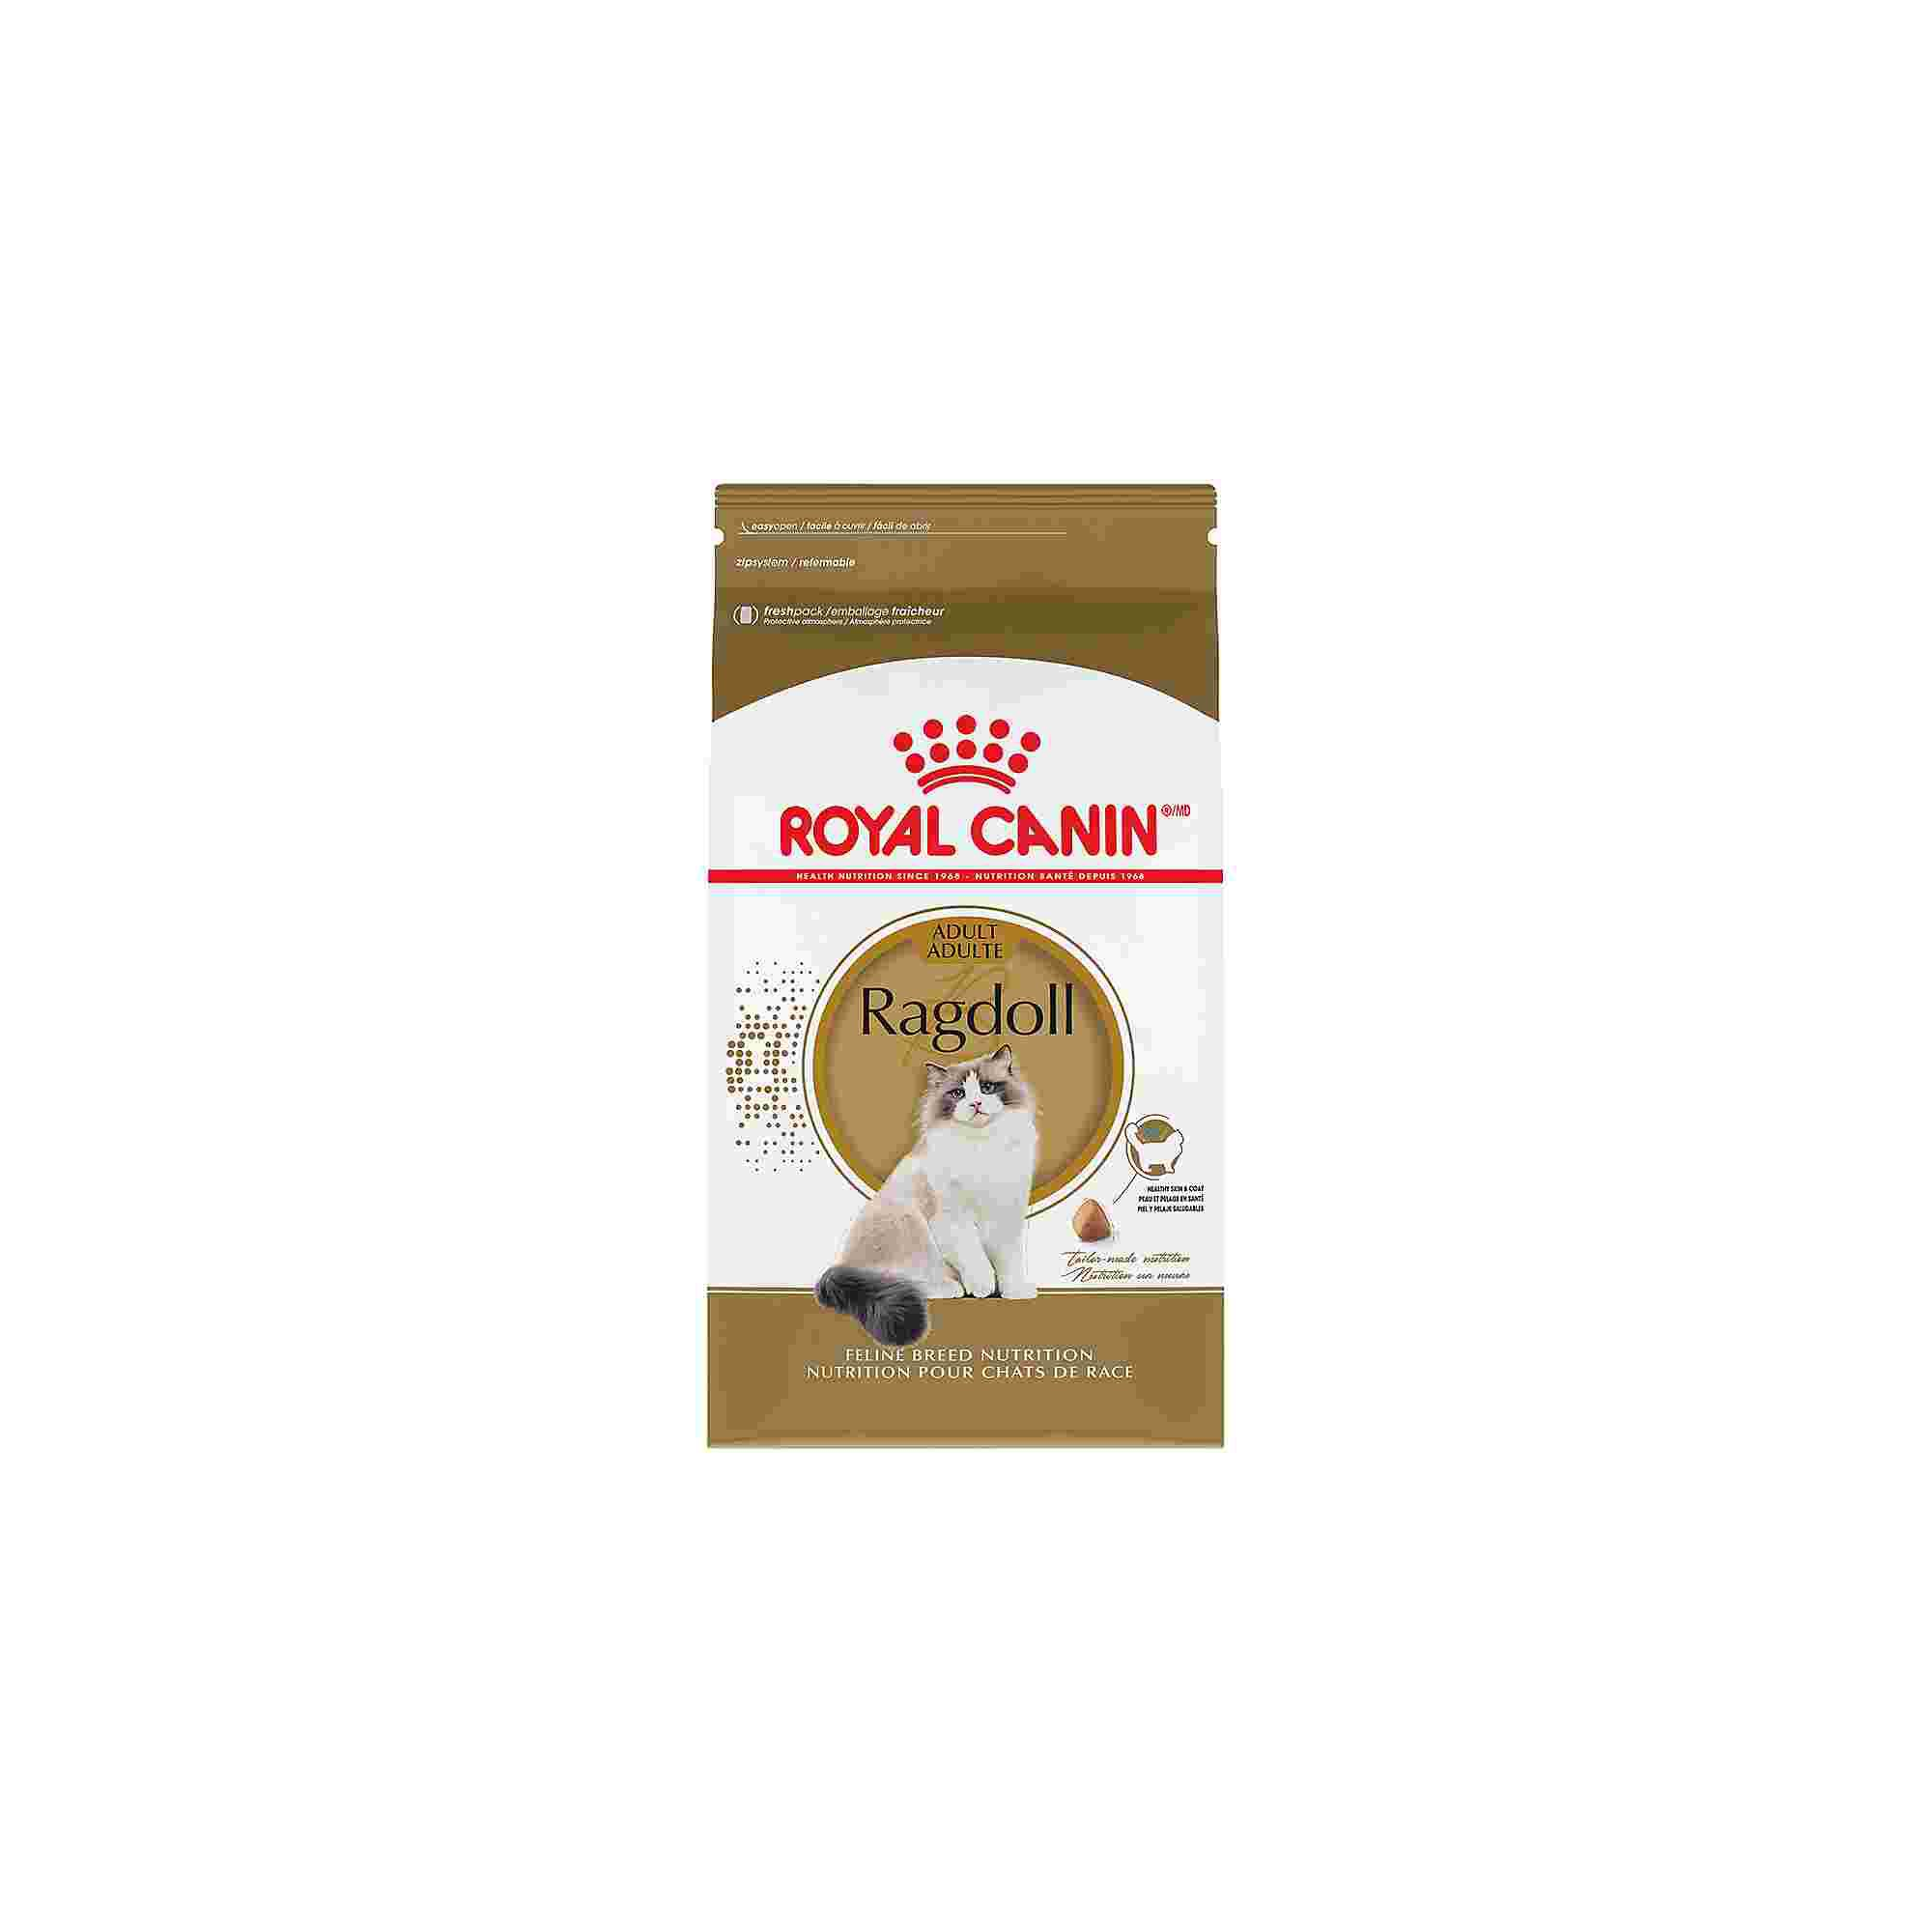 Royal Canin Ragdoll Adult Cat Food